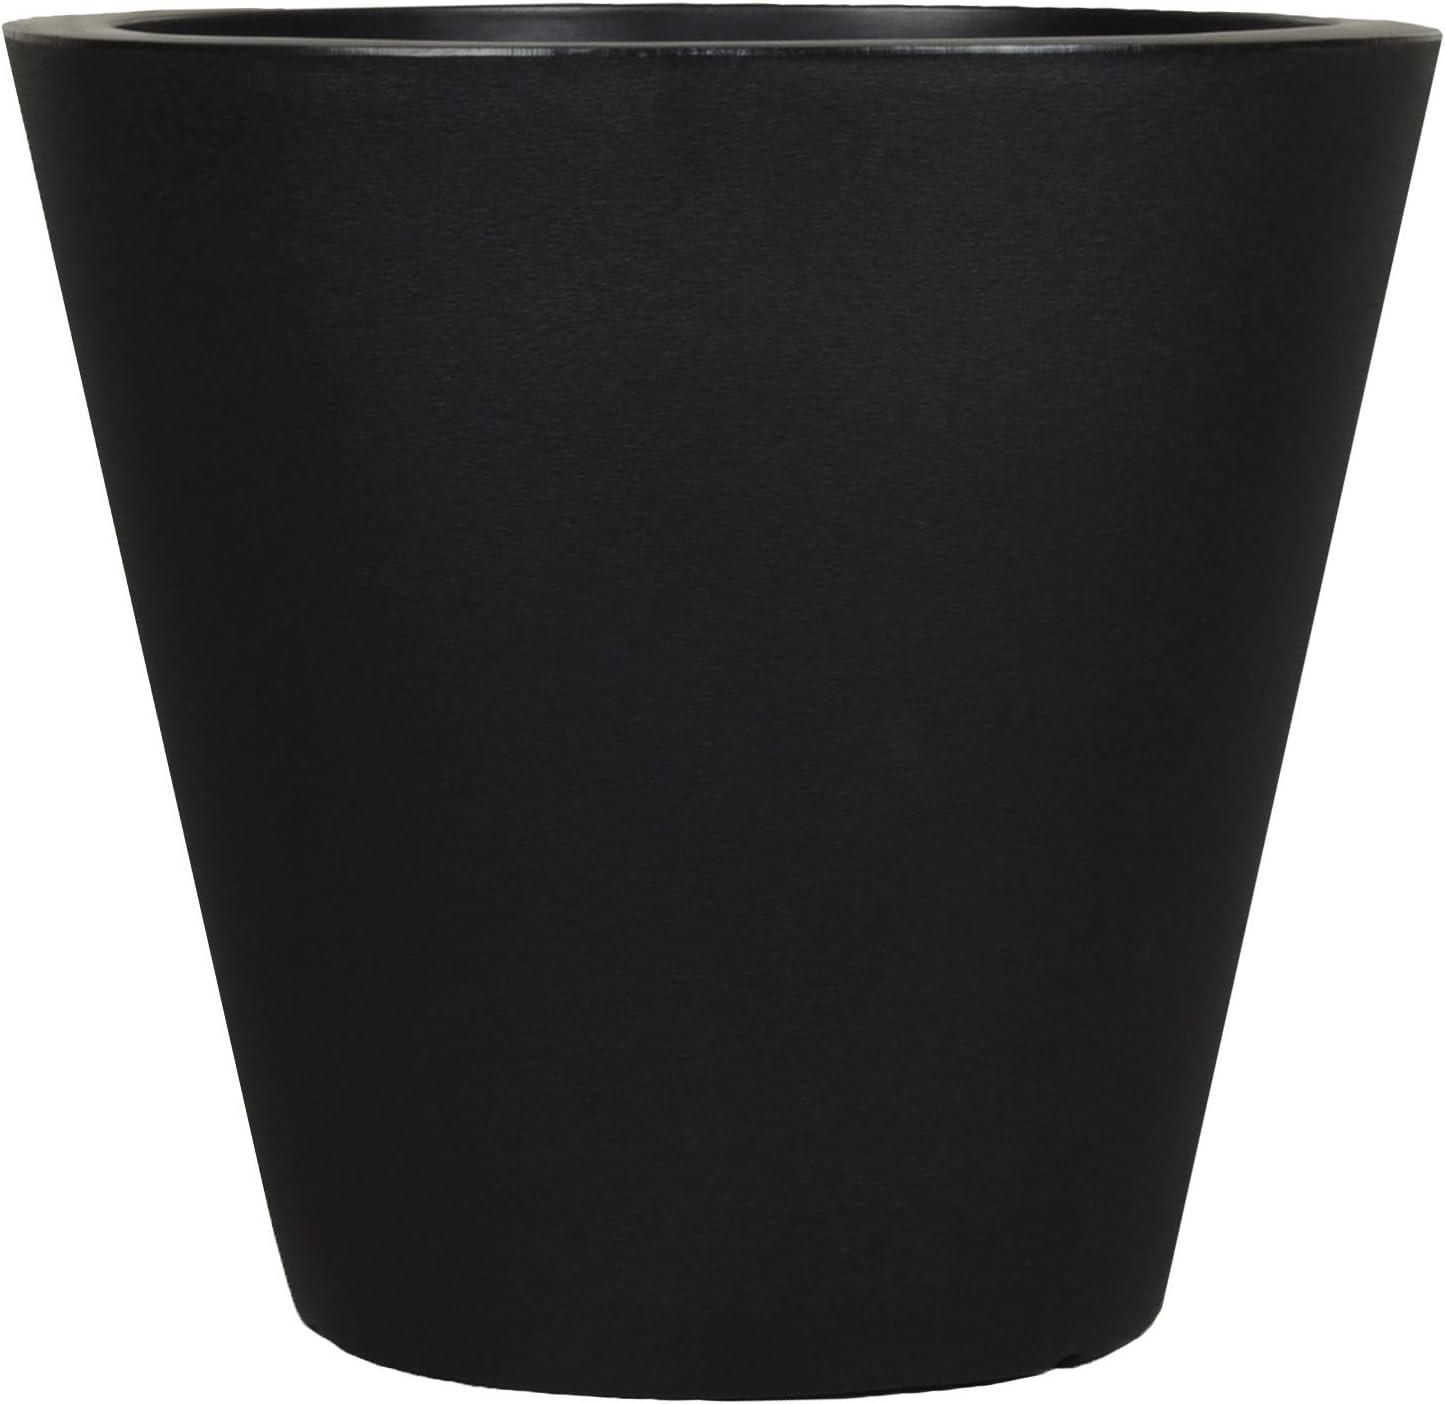 Tusco Products CR16BK Cosmopolitan Round Garden Planter, 16 by 9.5-Inch, Black